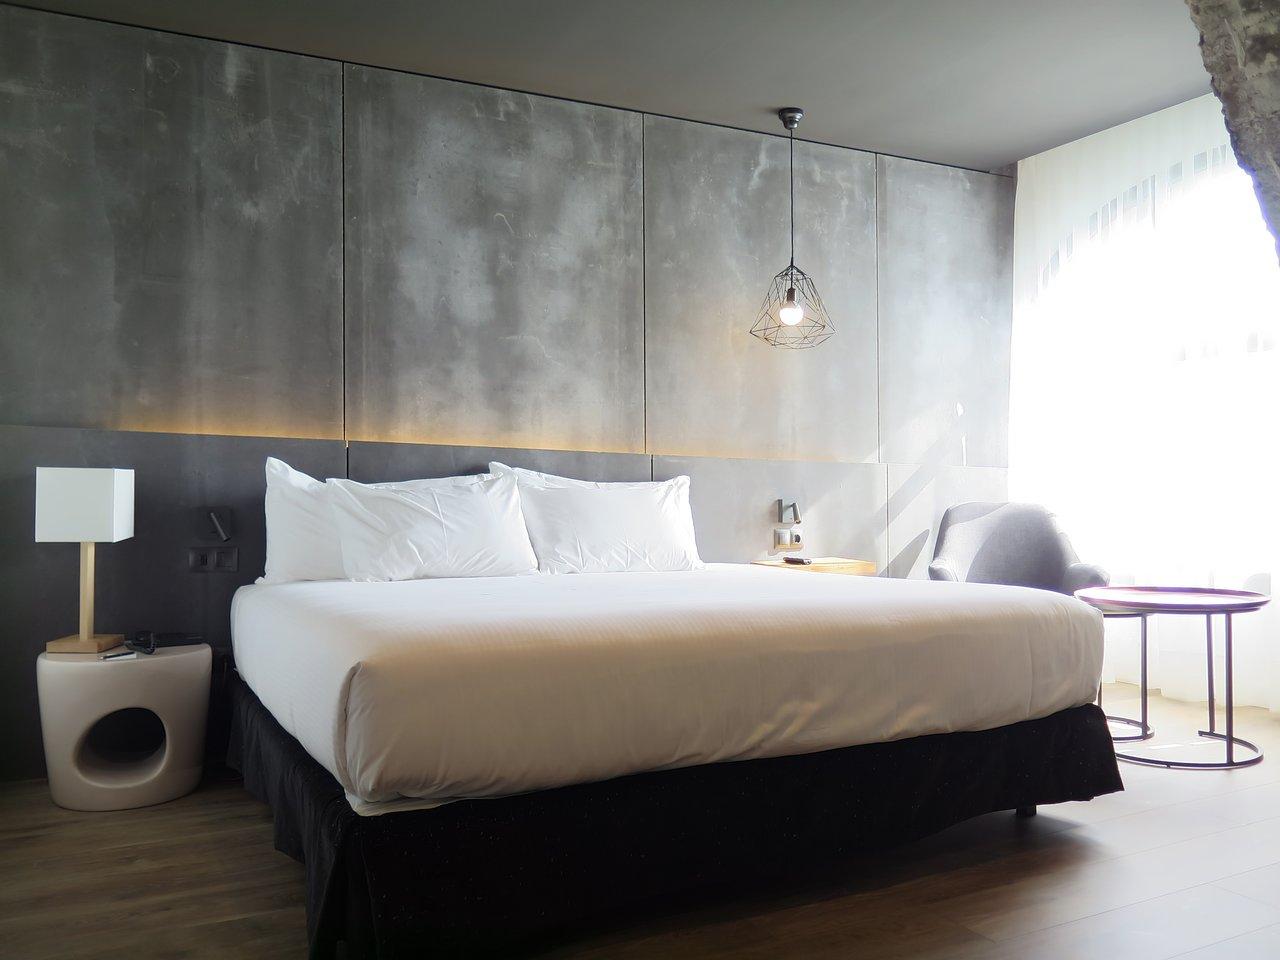 HOTEL TAYKO BILBAO $86 ($̶9̶8̶) Updated 2020 Prices